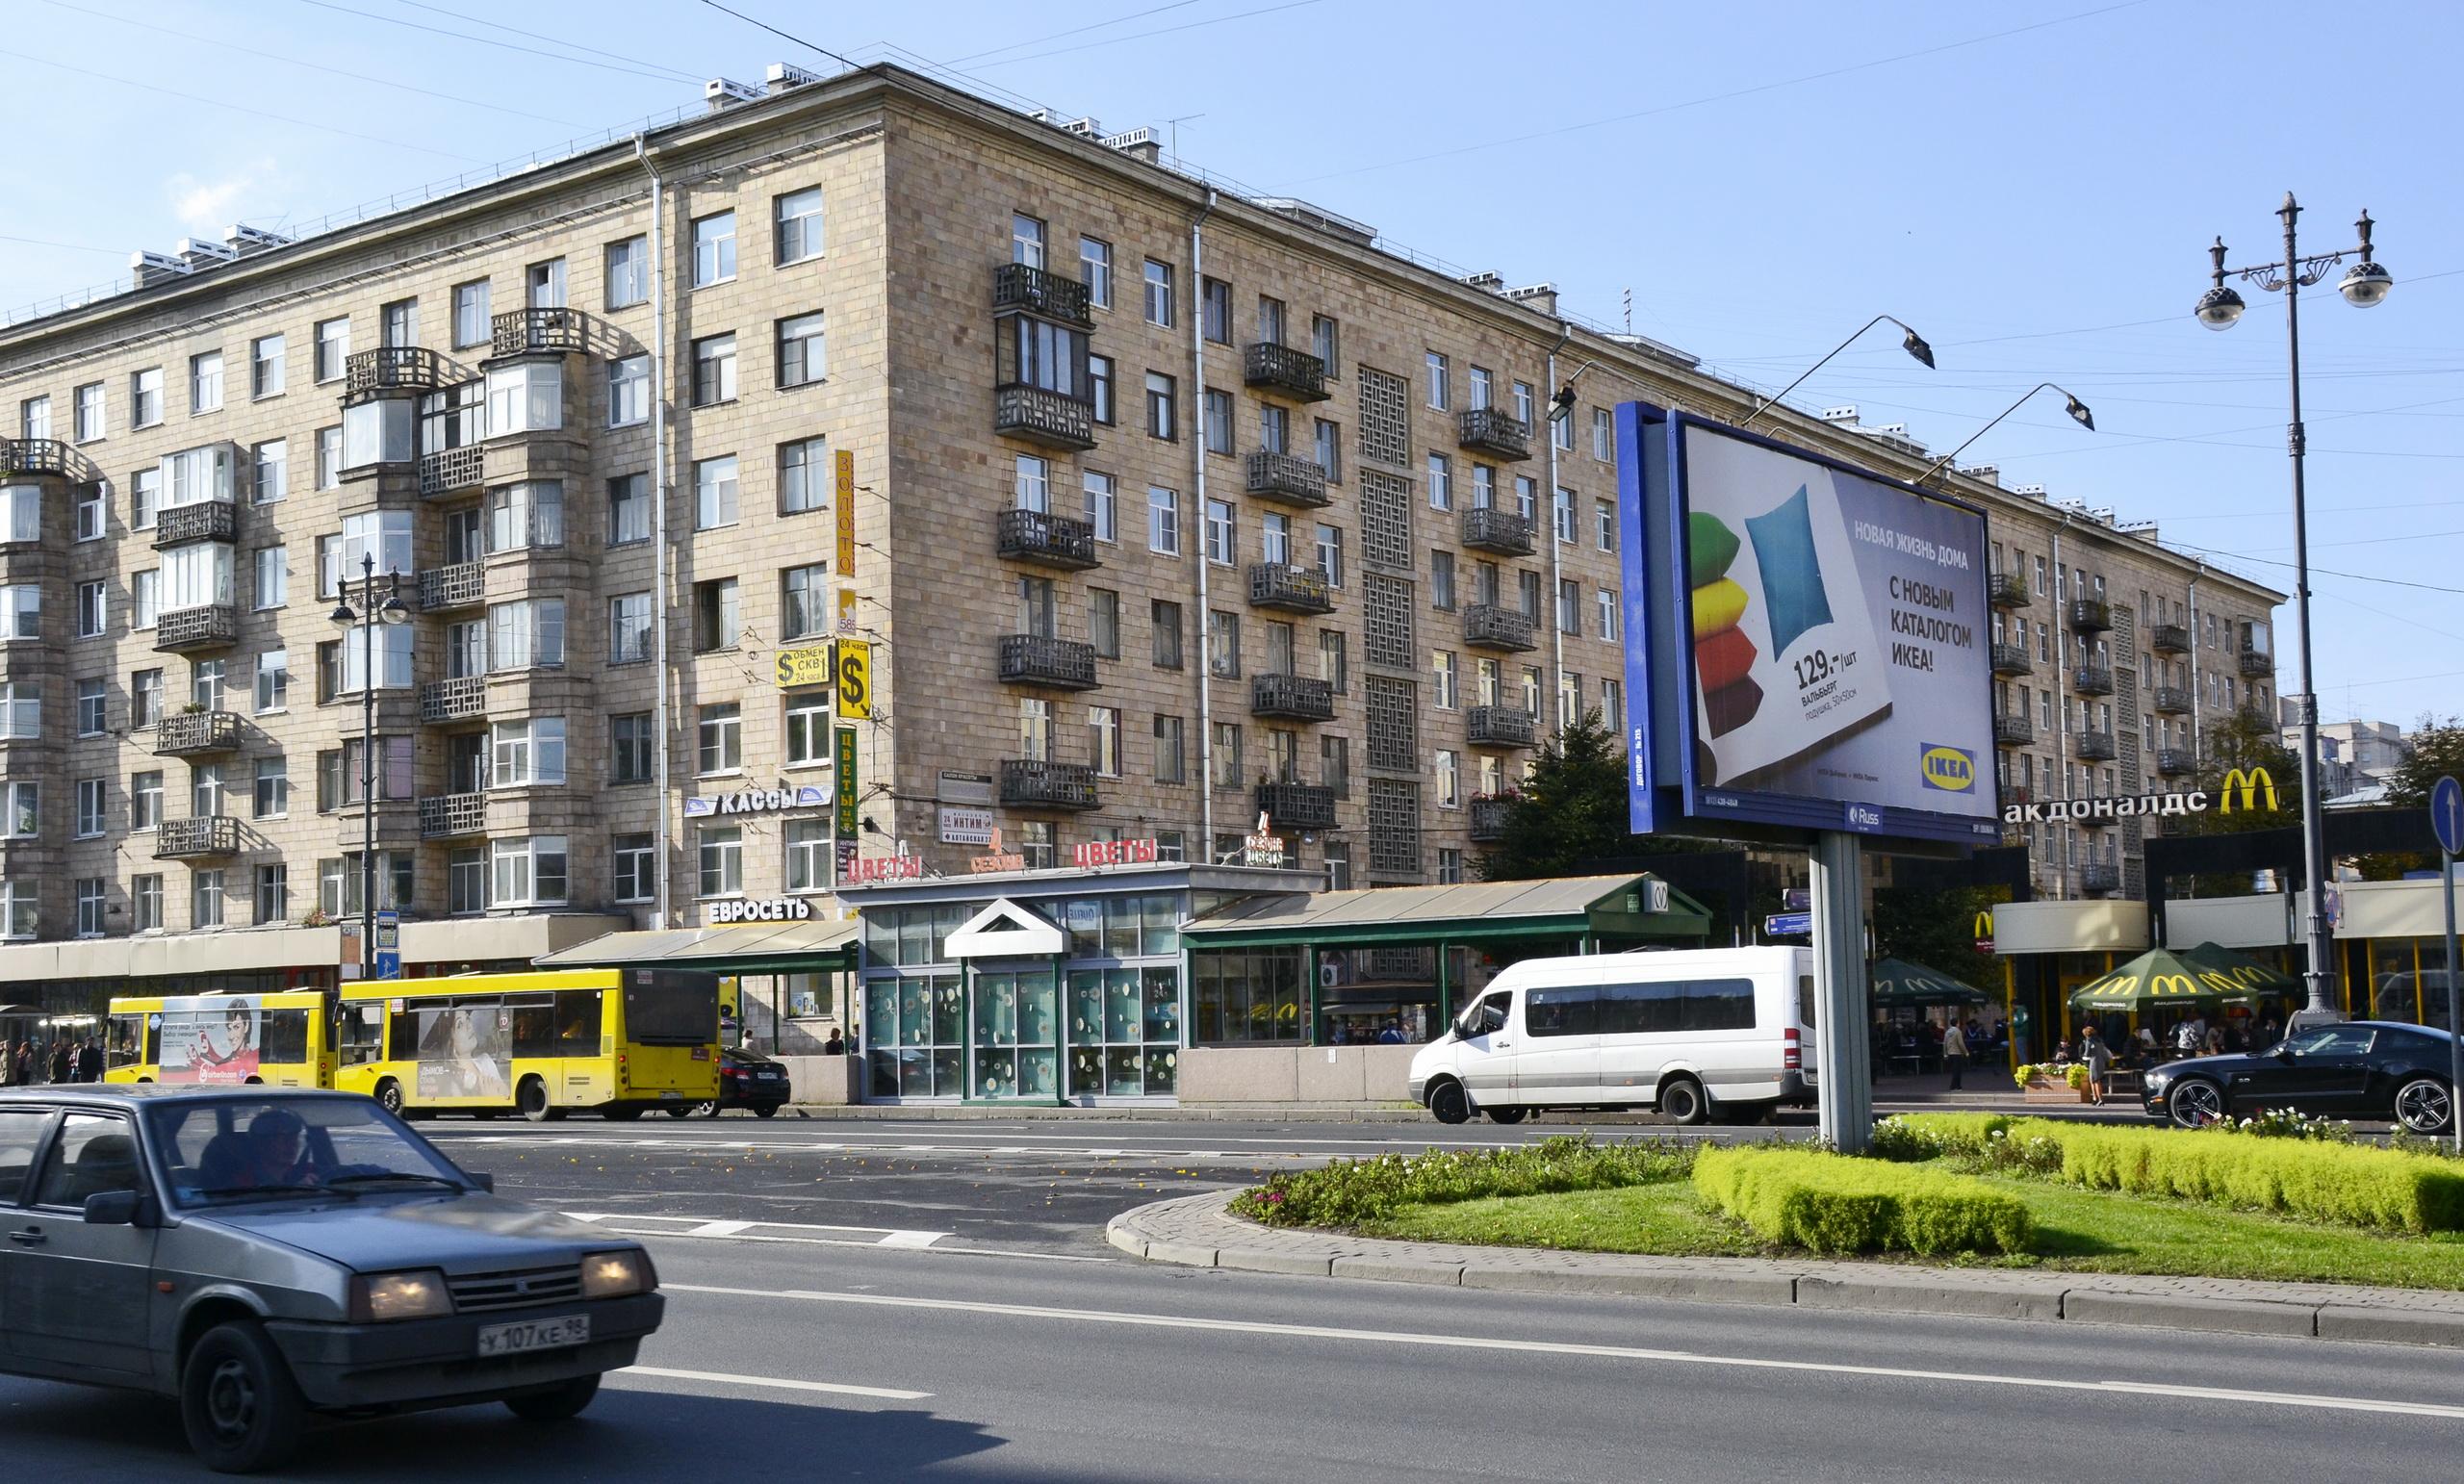 http://spb-gid.ru/wp-content/uploads/2012/10/ostanovka.jpg